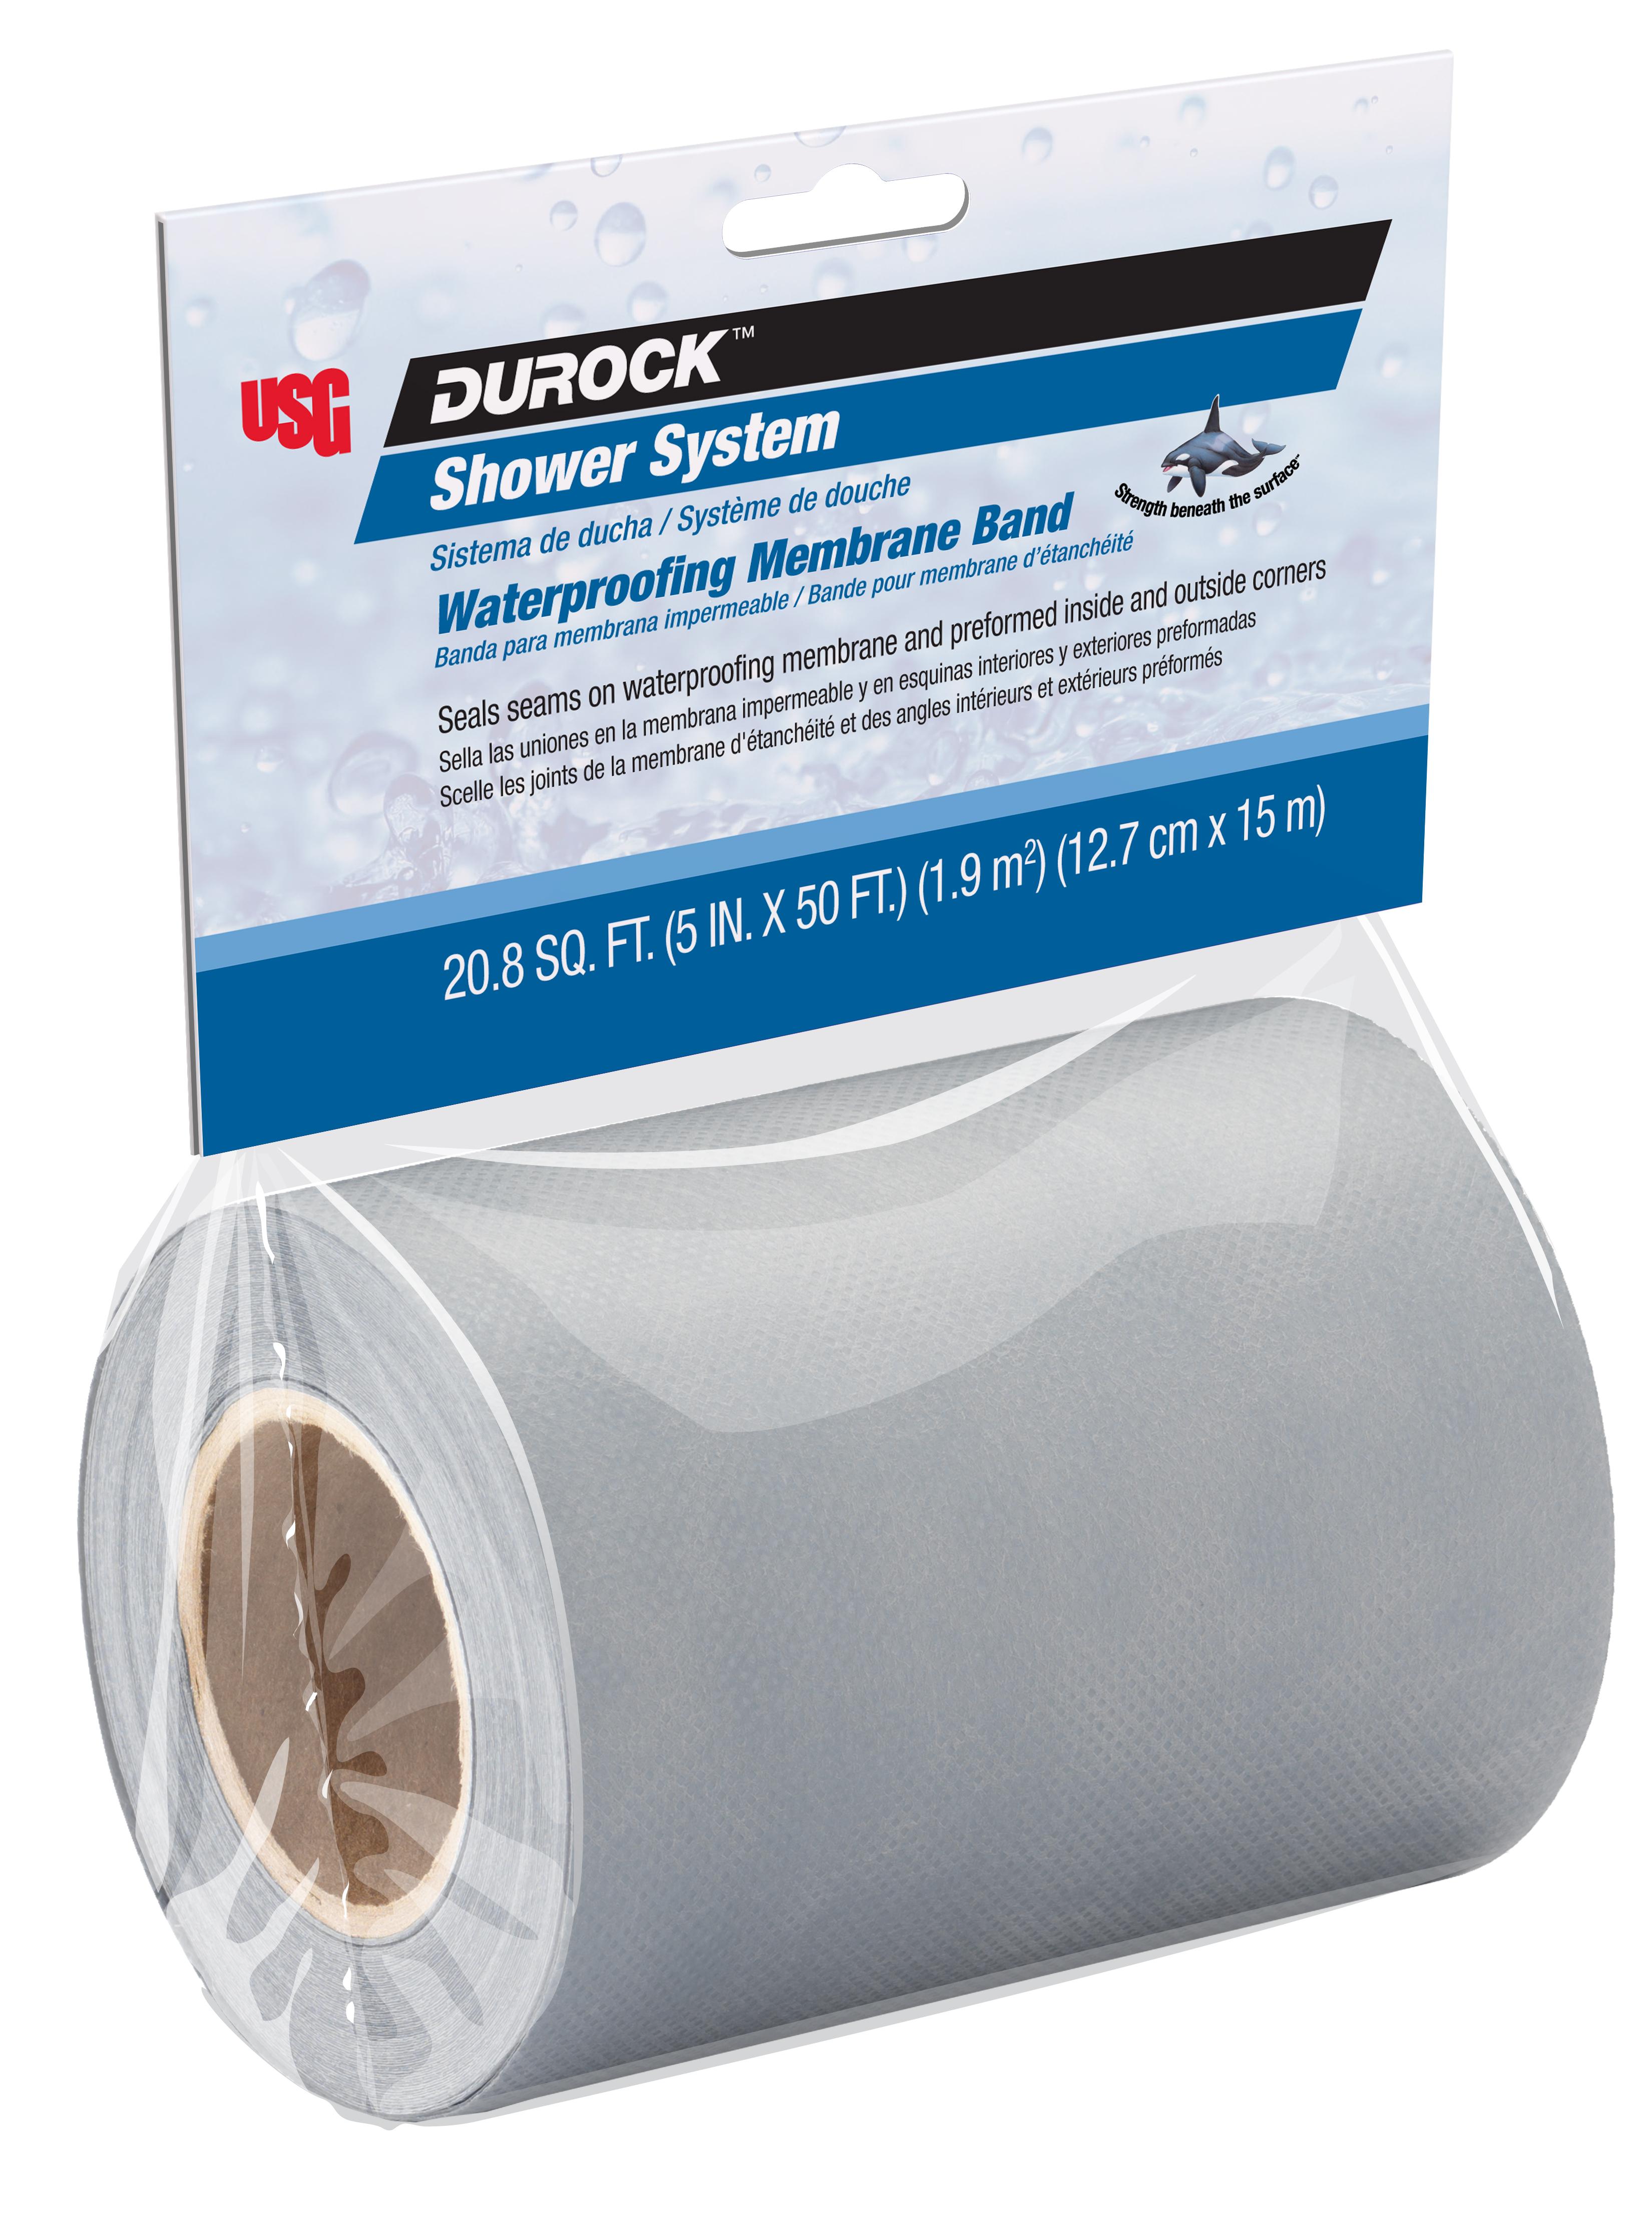 USG Durock Shower System Waterproofing Membrane 36 x 100 Rolls